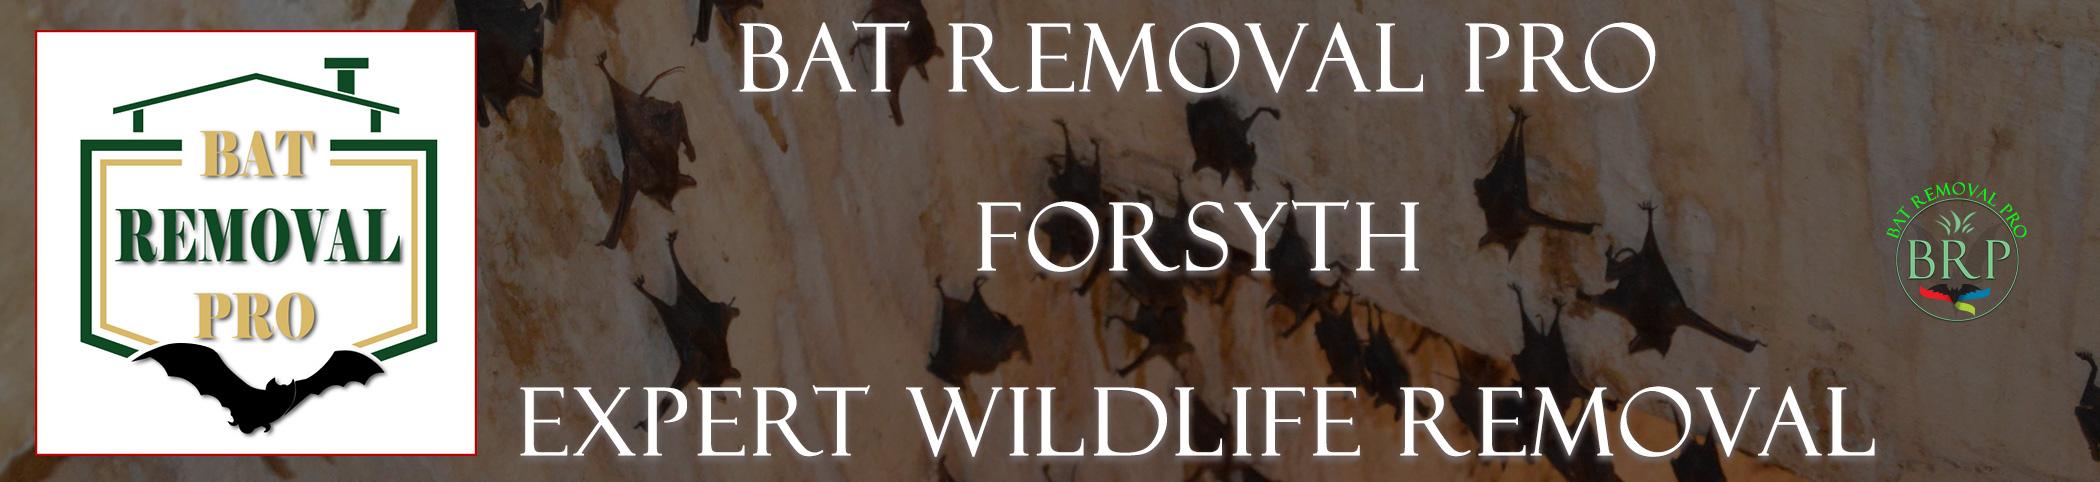 forsyth-bat-removal-at-bat-removal-pro-header-image